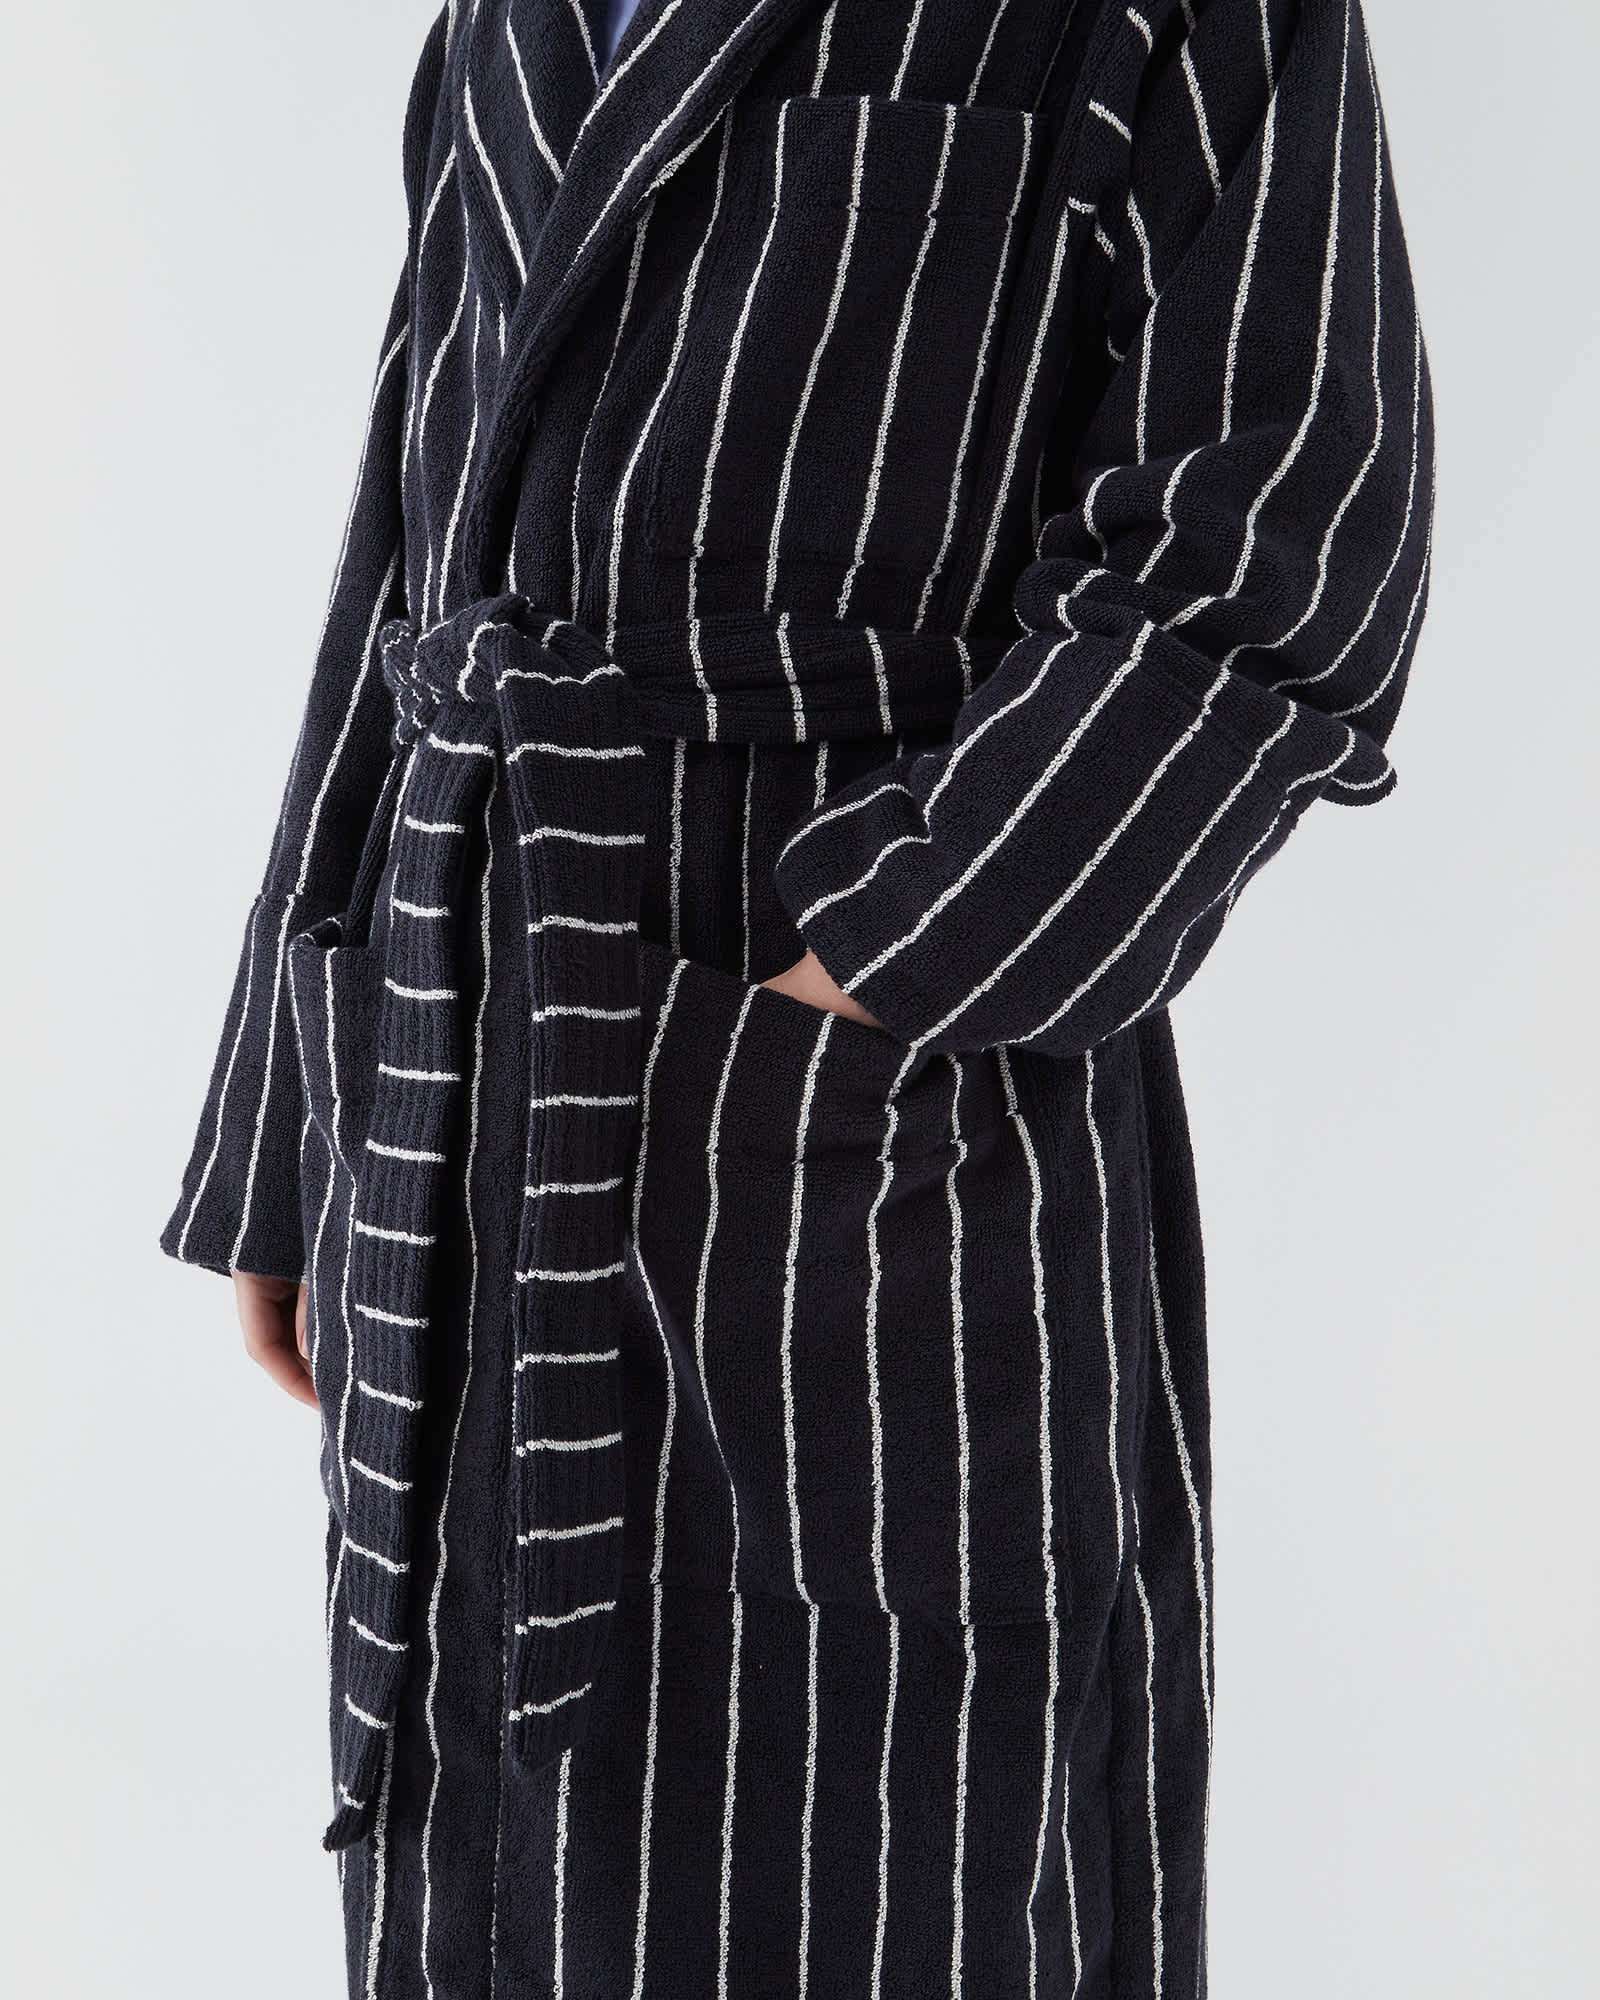 Tekla Classic Robe - Antwerp